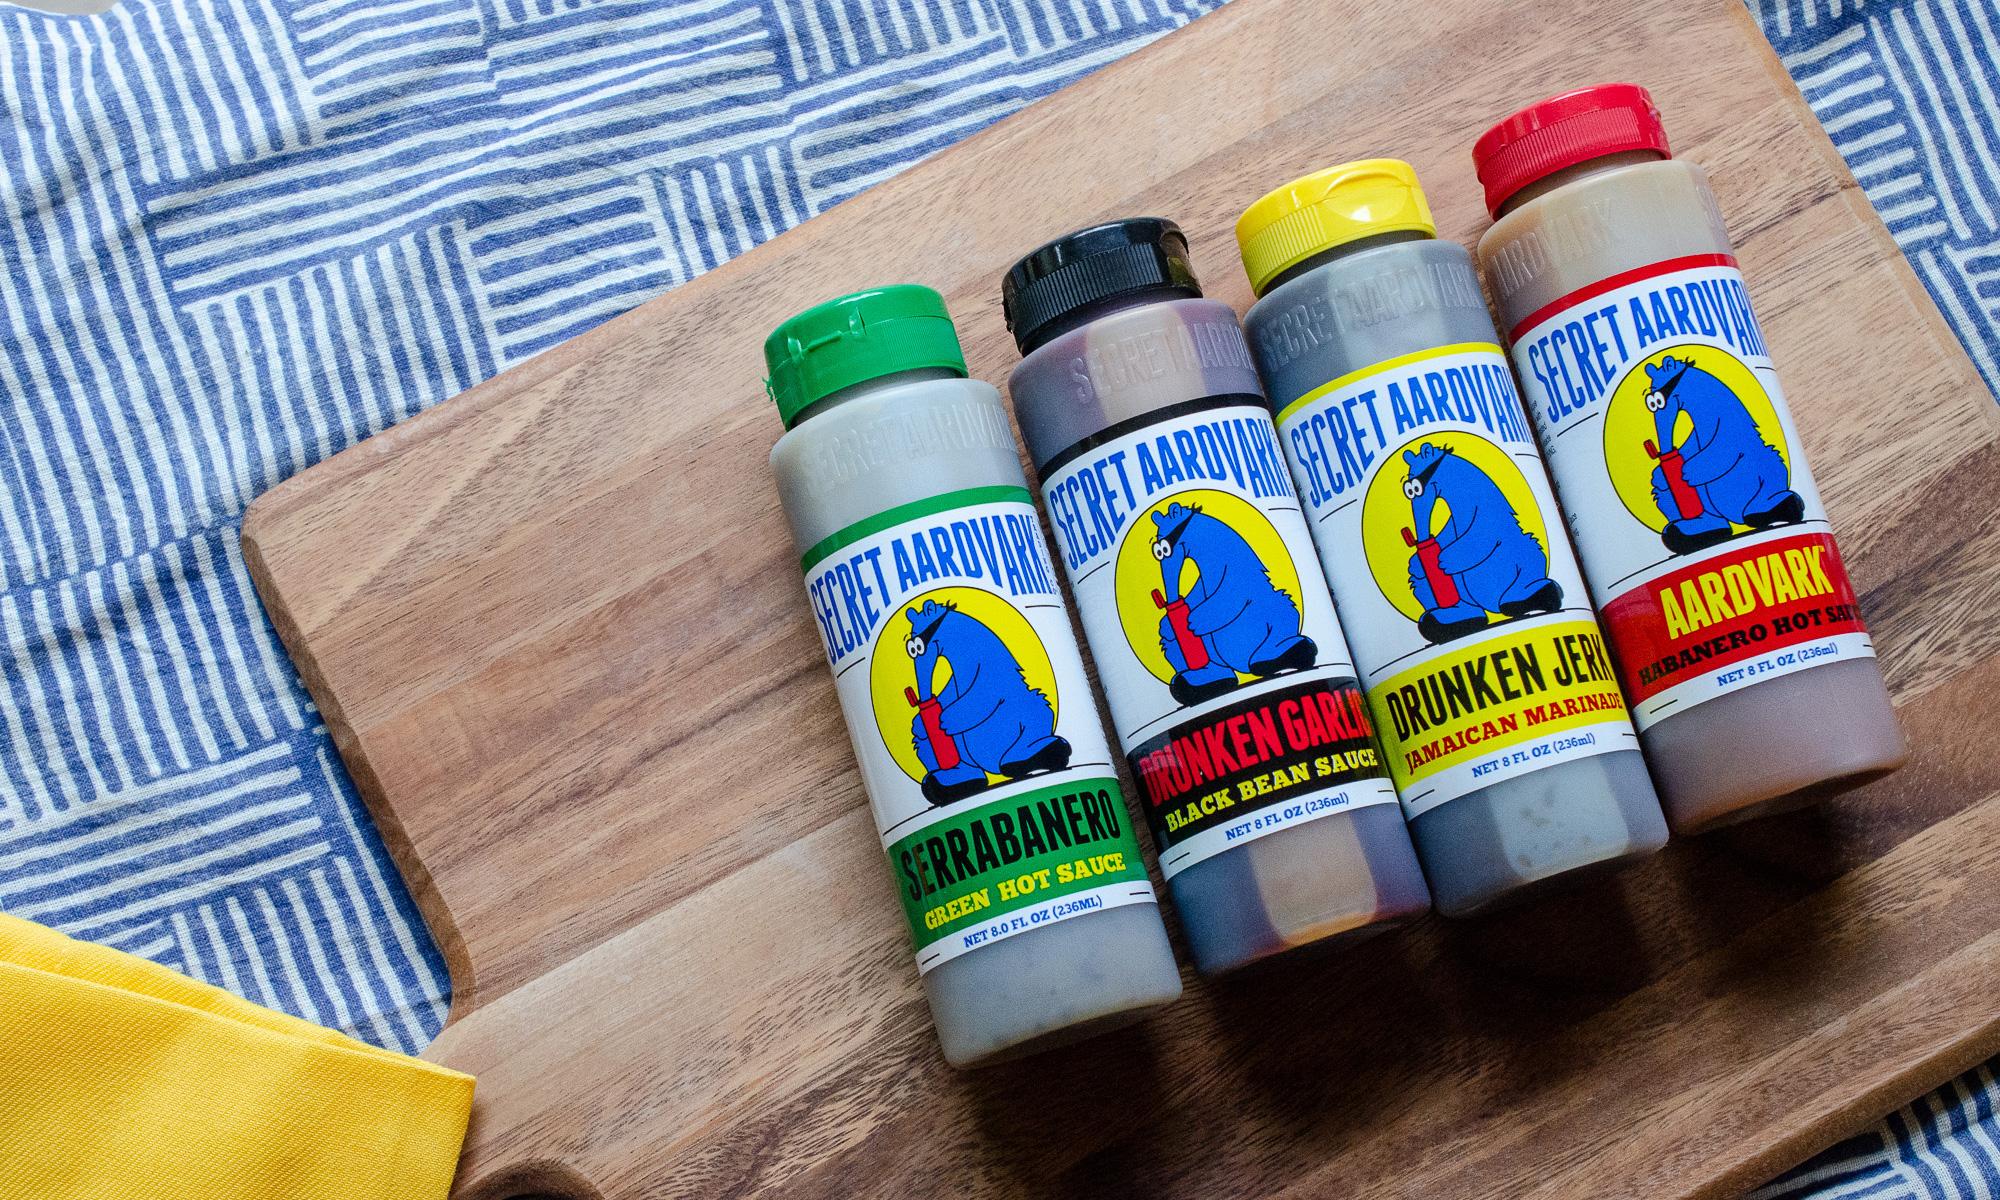 Bottles of Secret Aardvark sauces (Drunken Jerk, Aardvark Habanero, Drunken Garlic, and Serrabanero) on a cutting board